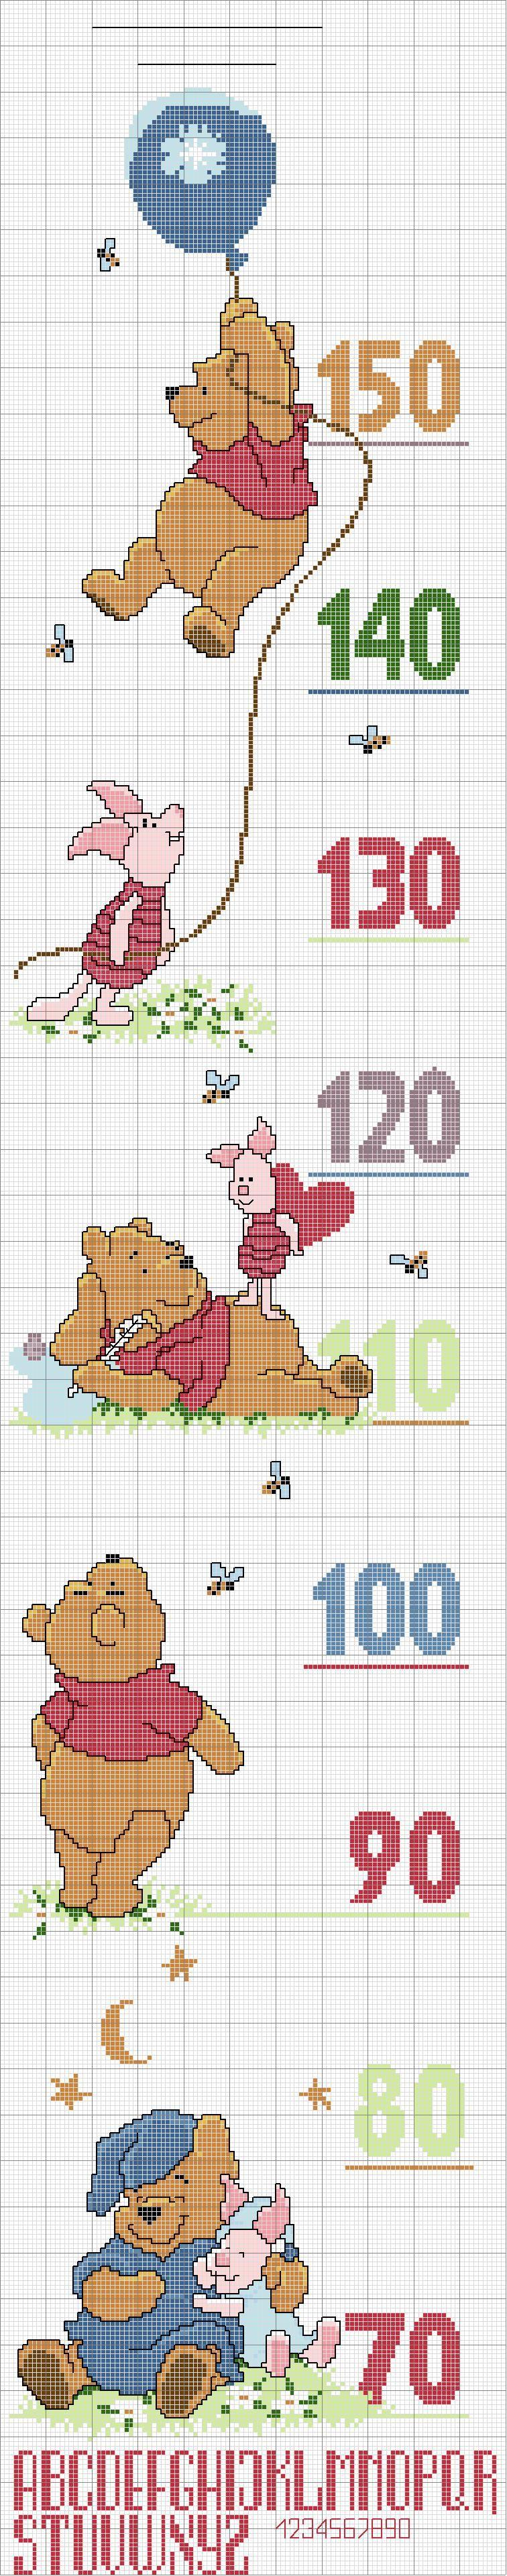 Toise Winnie Cross Stiches Pinterest Cross Stitch Stitch And